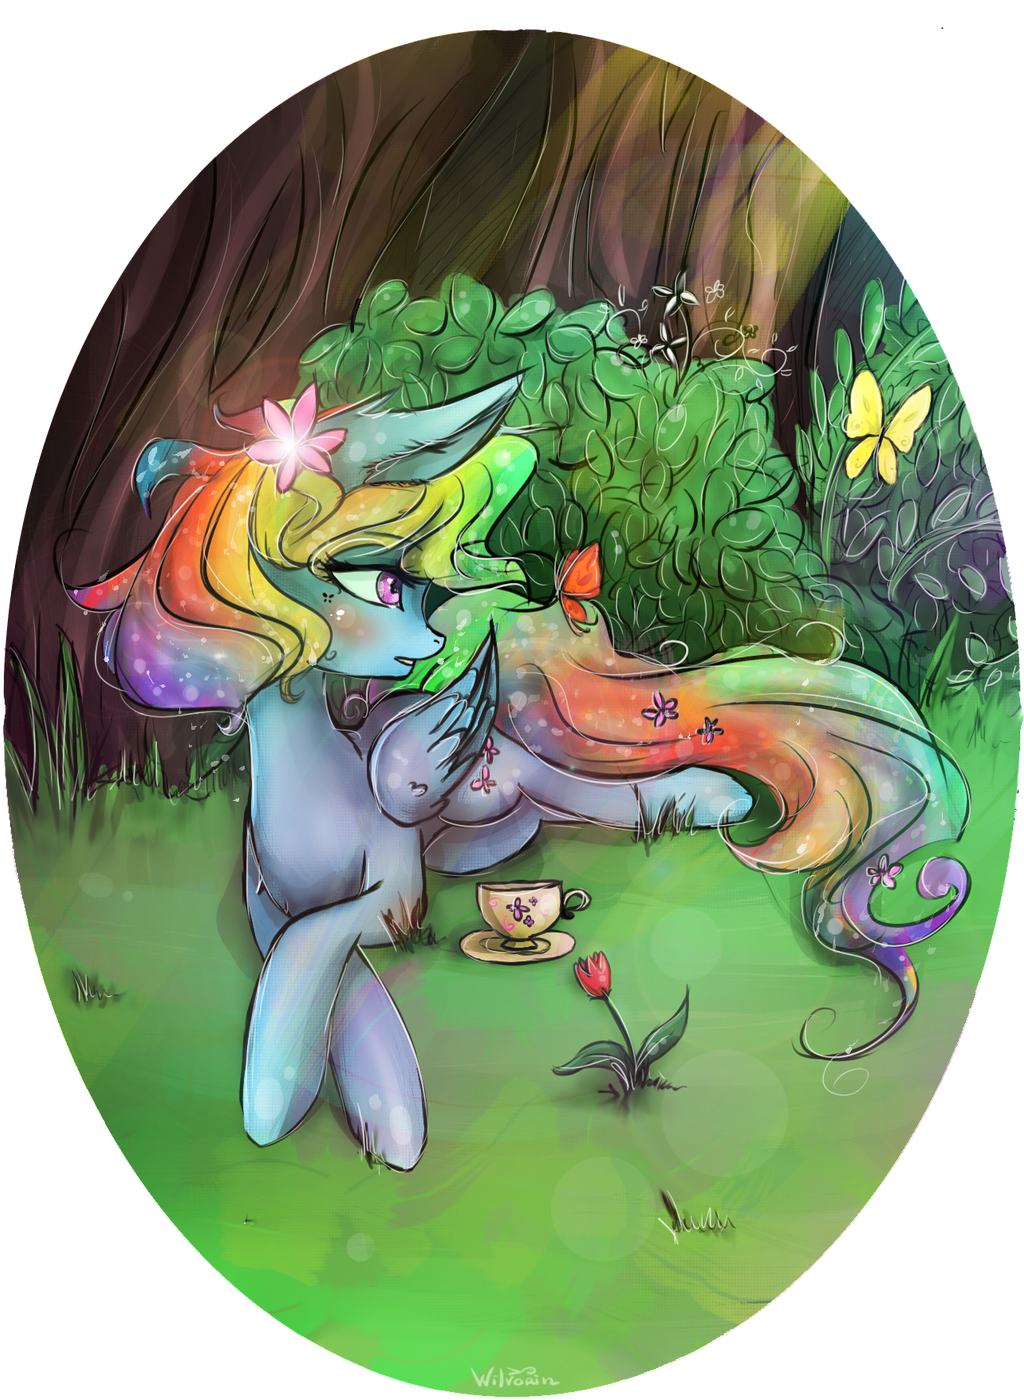 rainbow_shy_by_wilvarin_liadon-d7x43i9.p